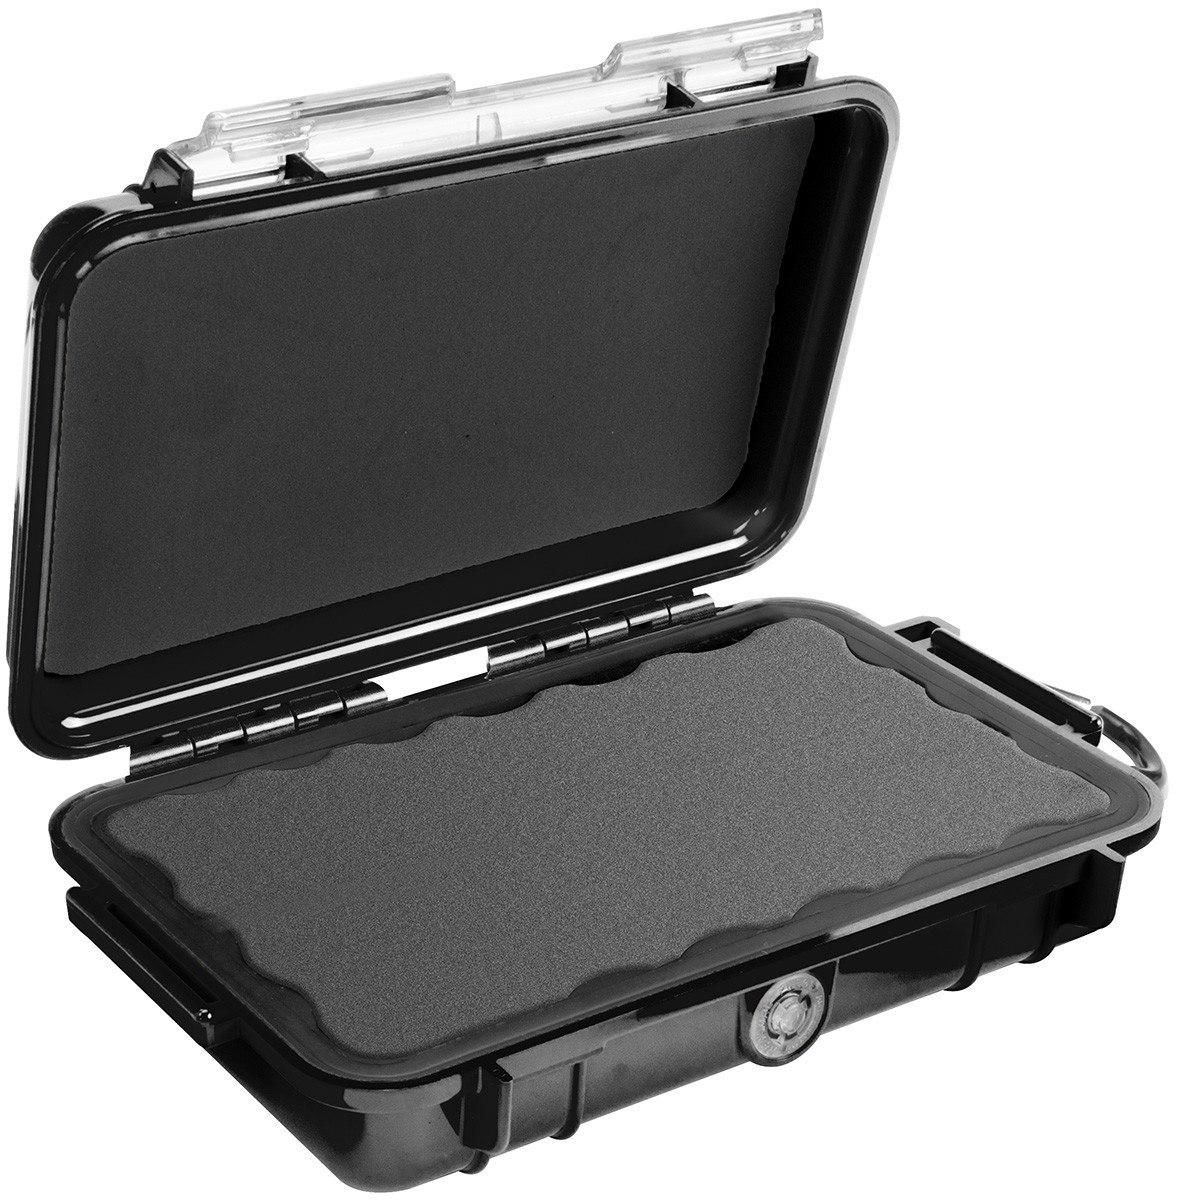 Pelican Micro Case 1040 Carrying Case Camera, Cellular Phone - Black